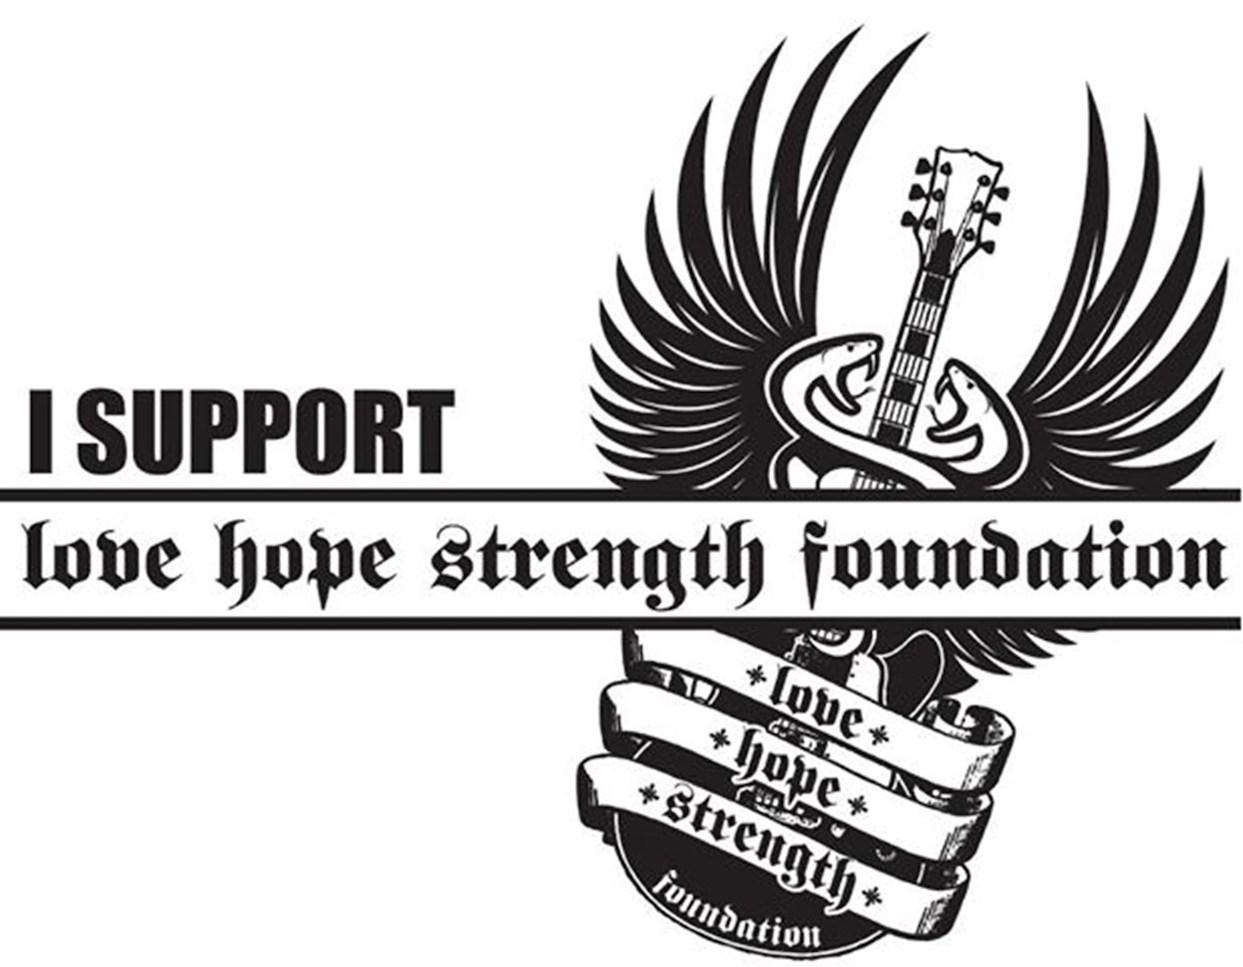 LOVE HOPE STRENGTH FOUNDATION